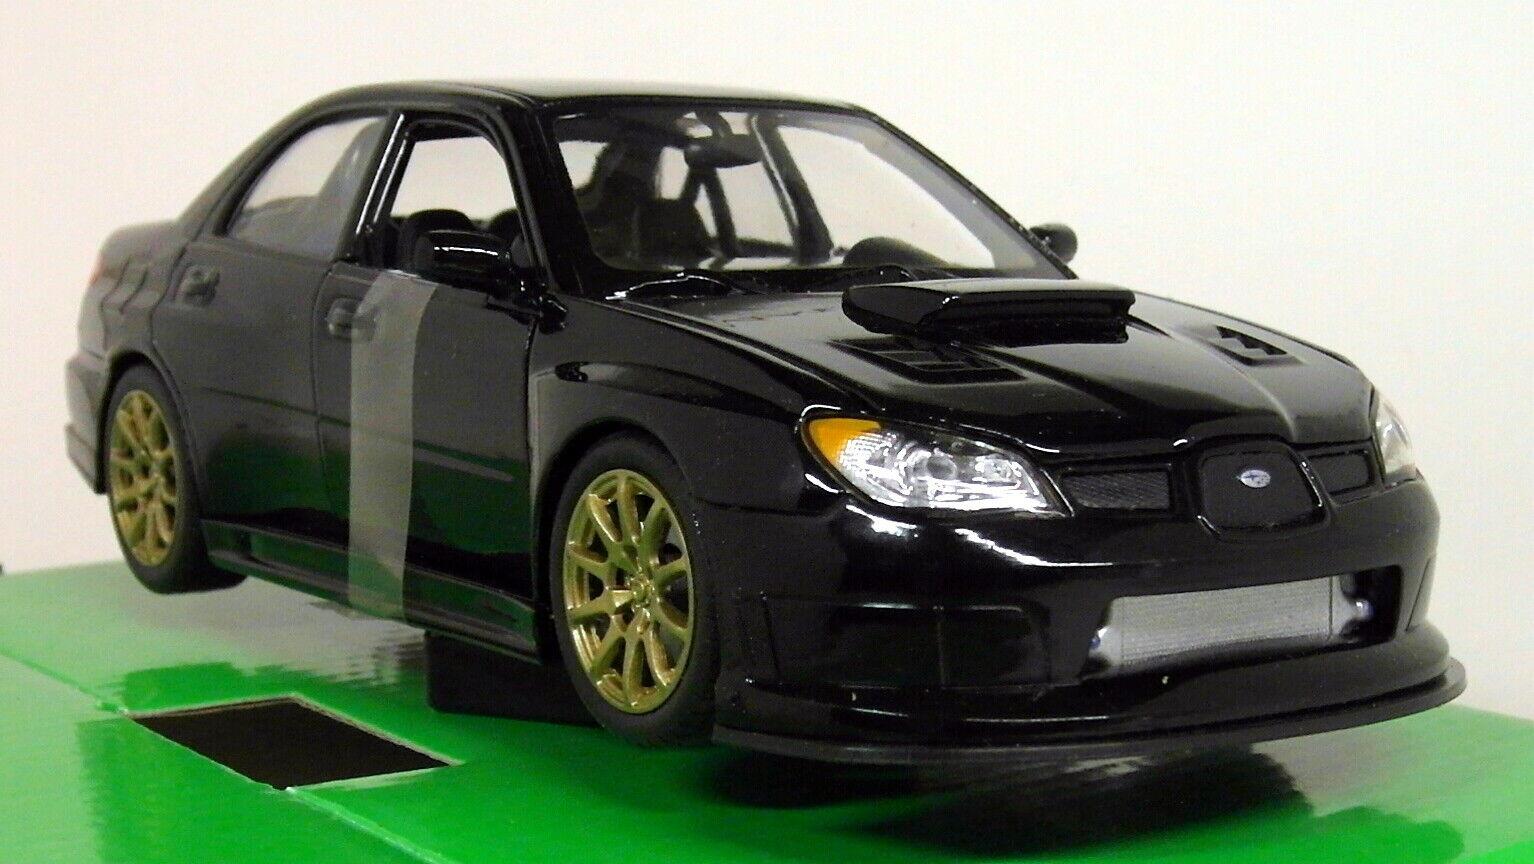 Nex Models 1 24-27 Scale Subaru Impreza Impreza Impreza WRX STi 2nd Gen Hawkeye BLK Diecast car bad8b8